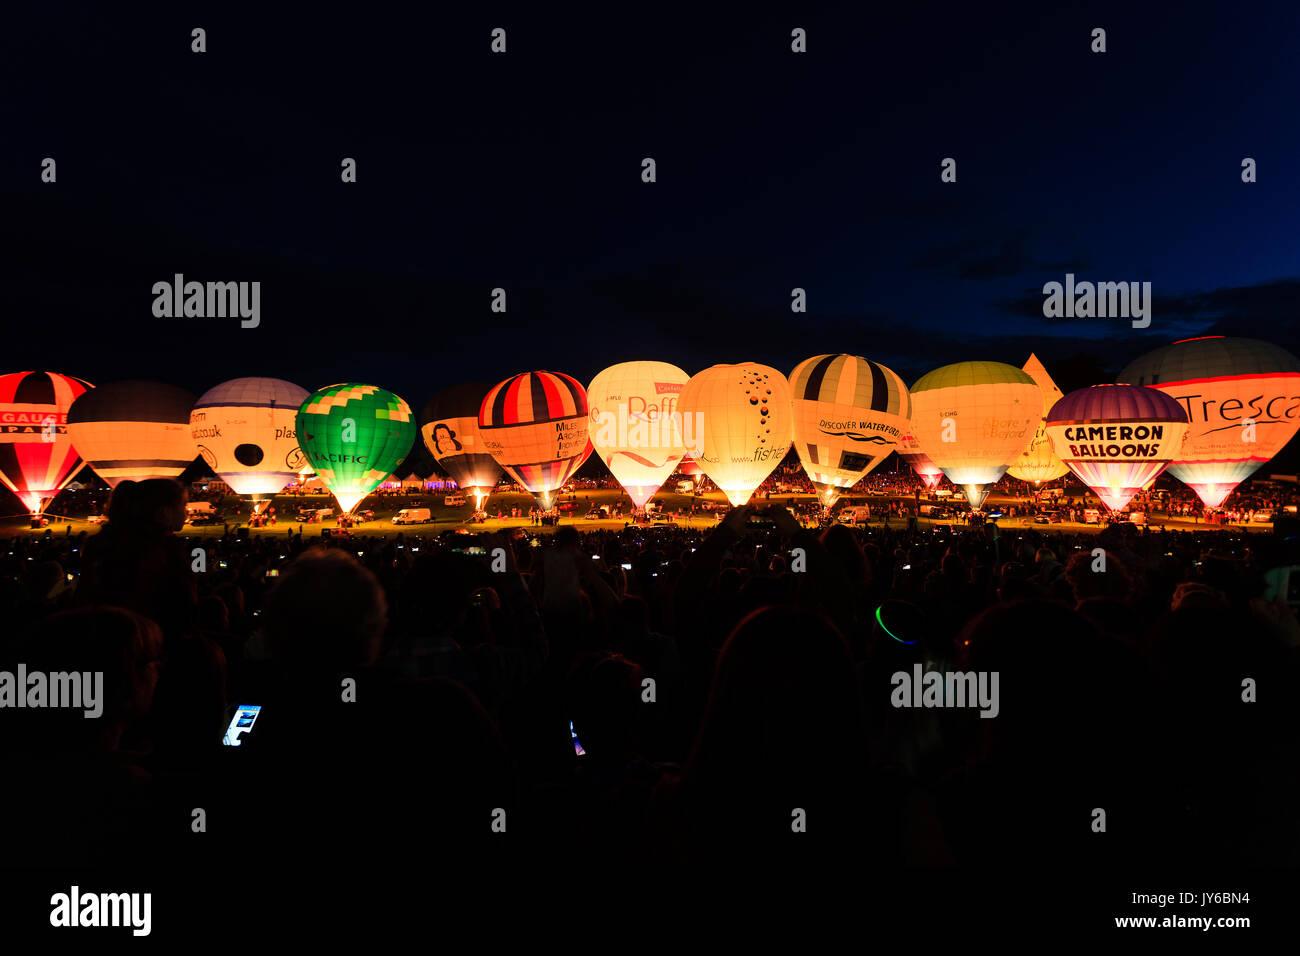 A view of the Night Glow at Bristol Balloon Fiesta 2017 at Ashton Court, Bristol. - Stock Image